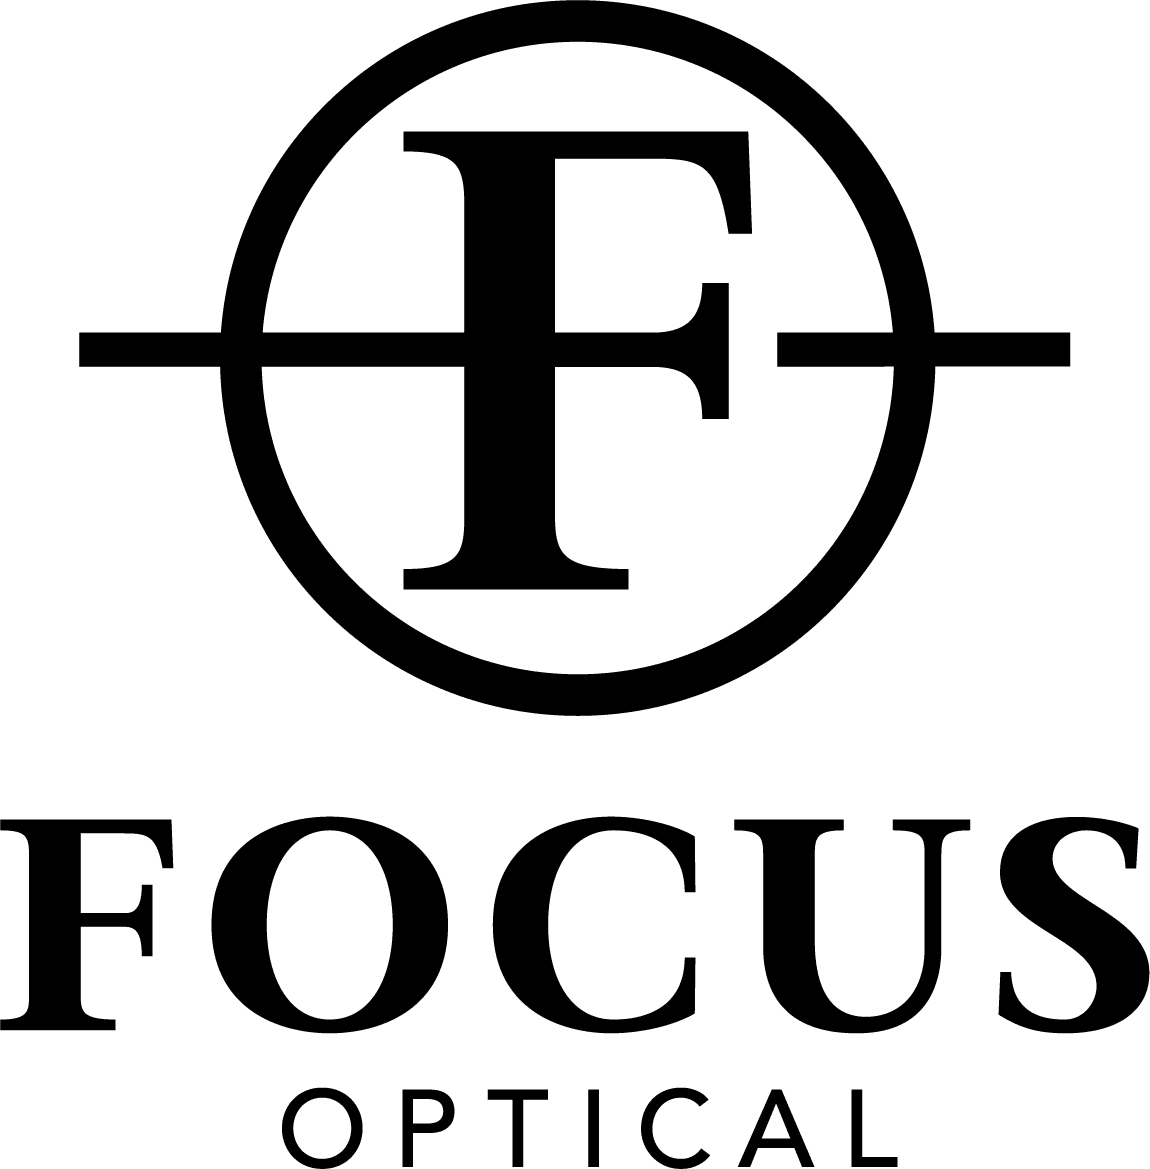 Focus Optical logo